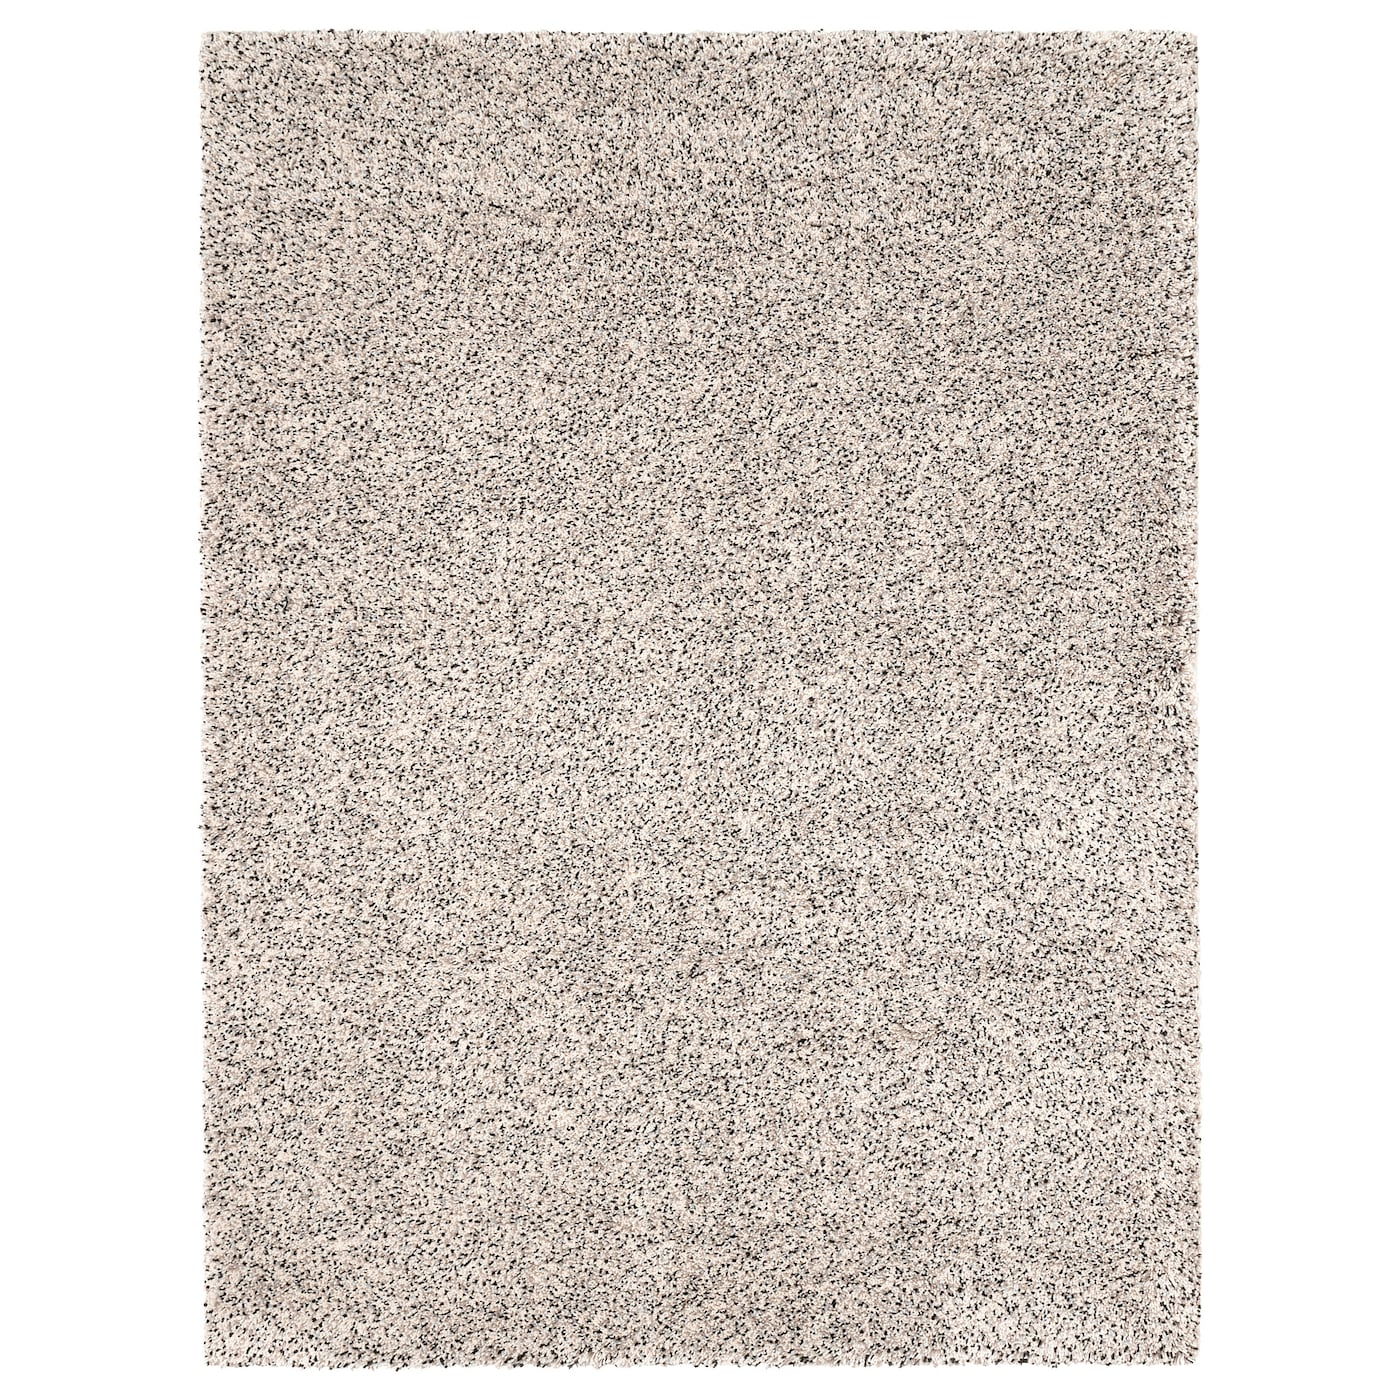 Vindum Rug High Pile White 200x270